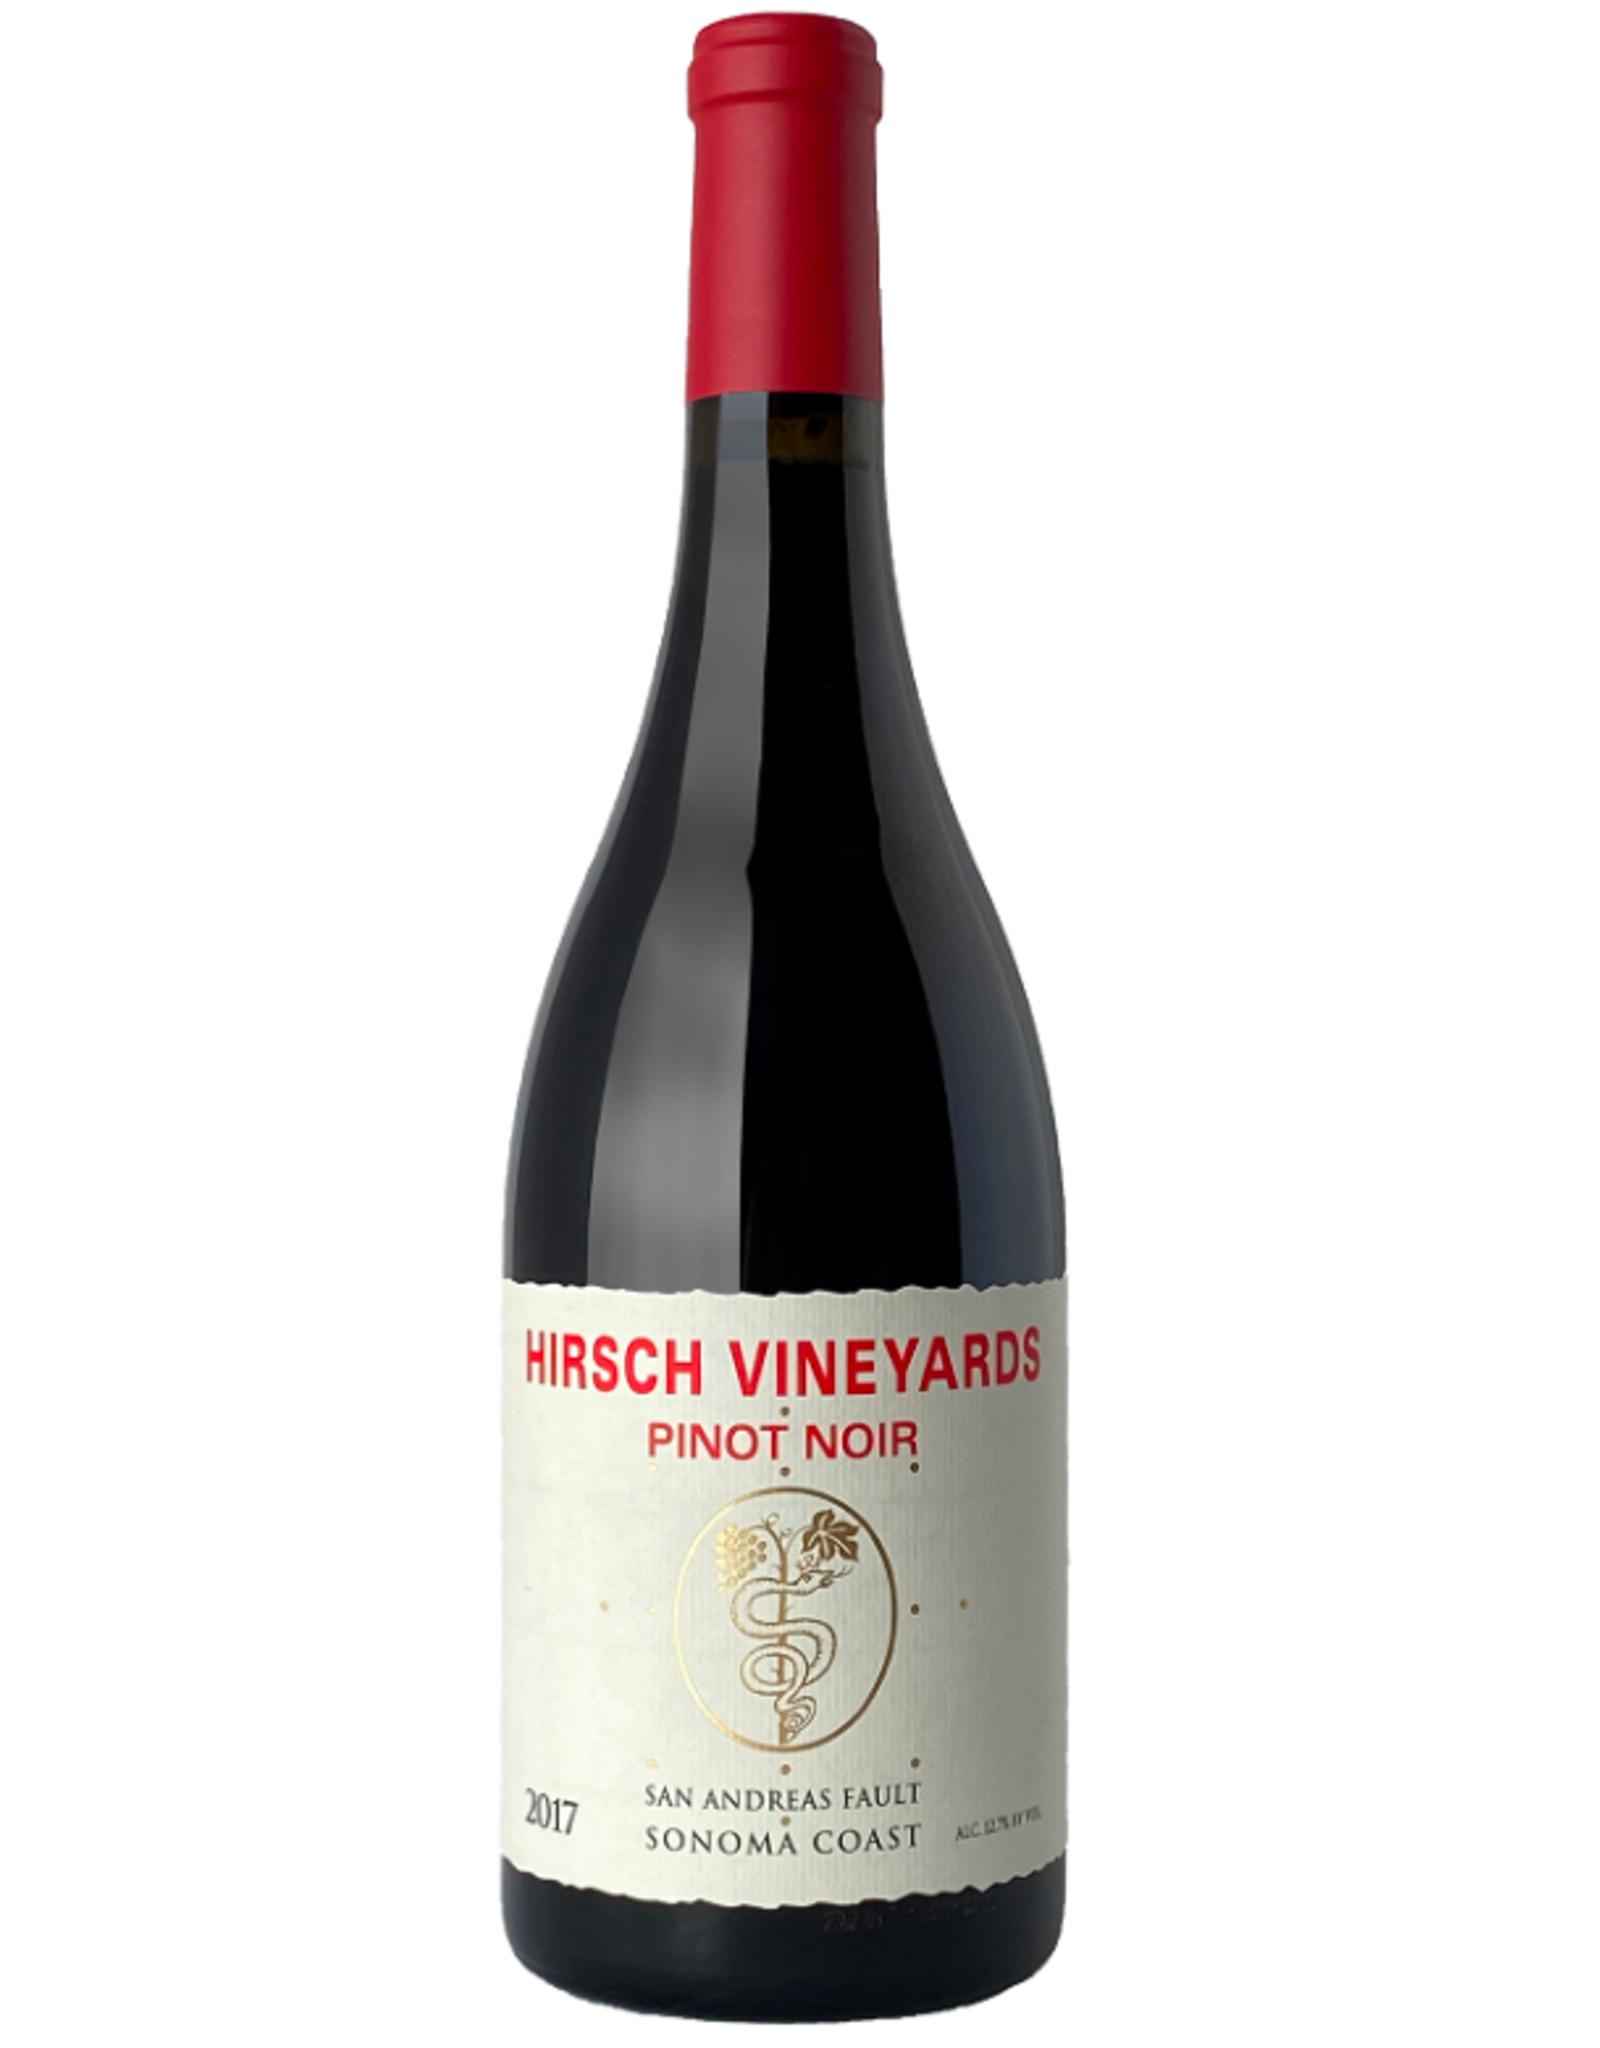 Hirsch Vineyards Pinot Noir San Andreas Fault Sonoma Coast 2017